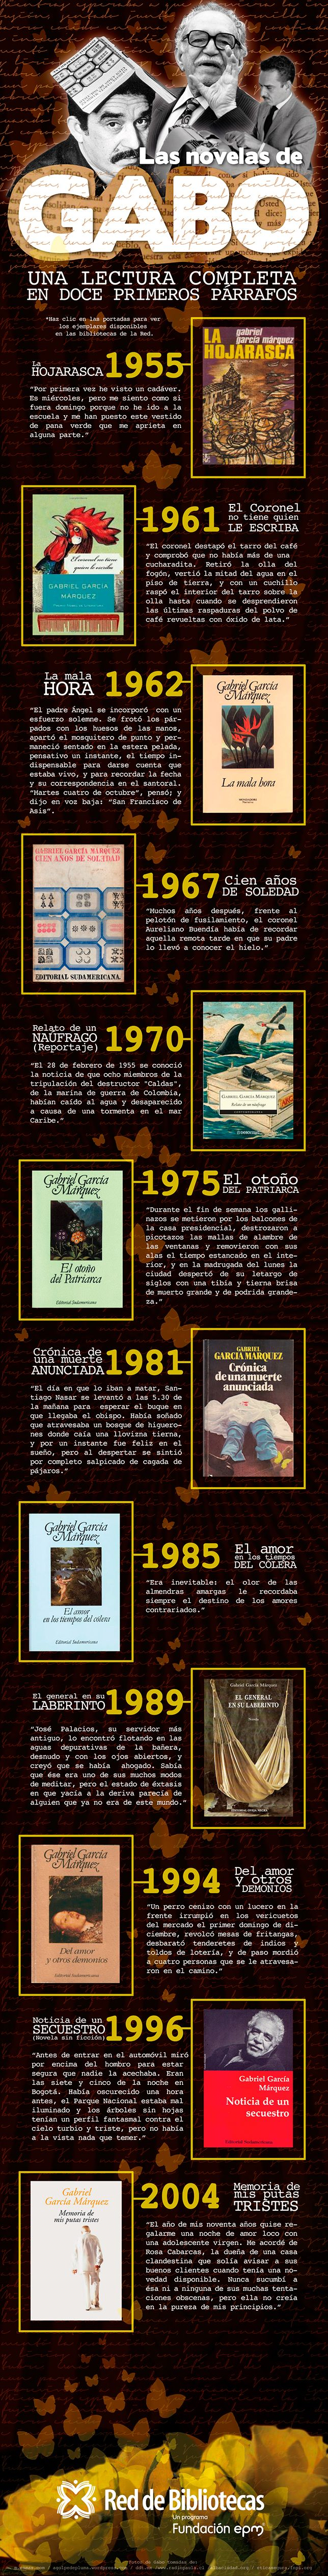 Las novelas de García Márquez #infografia #infographic